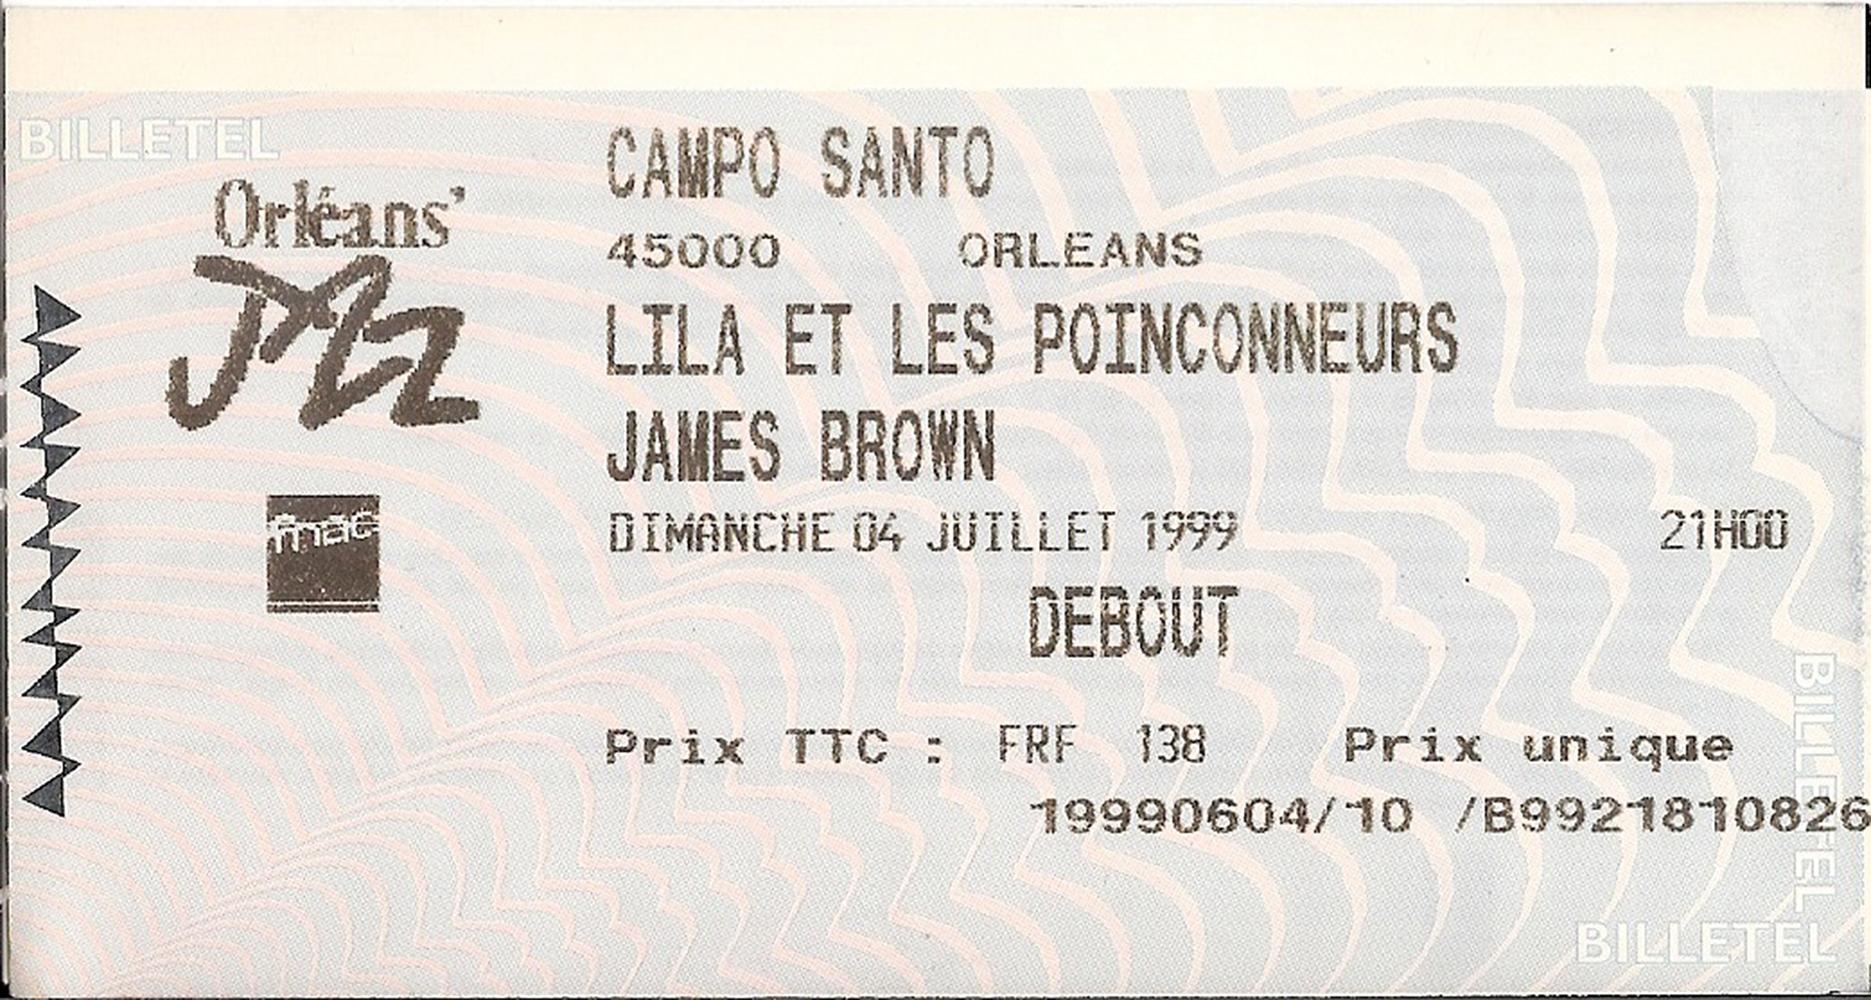 1999_07_04_ticket